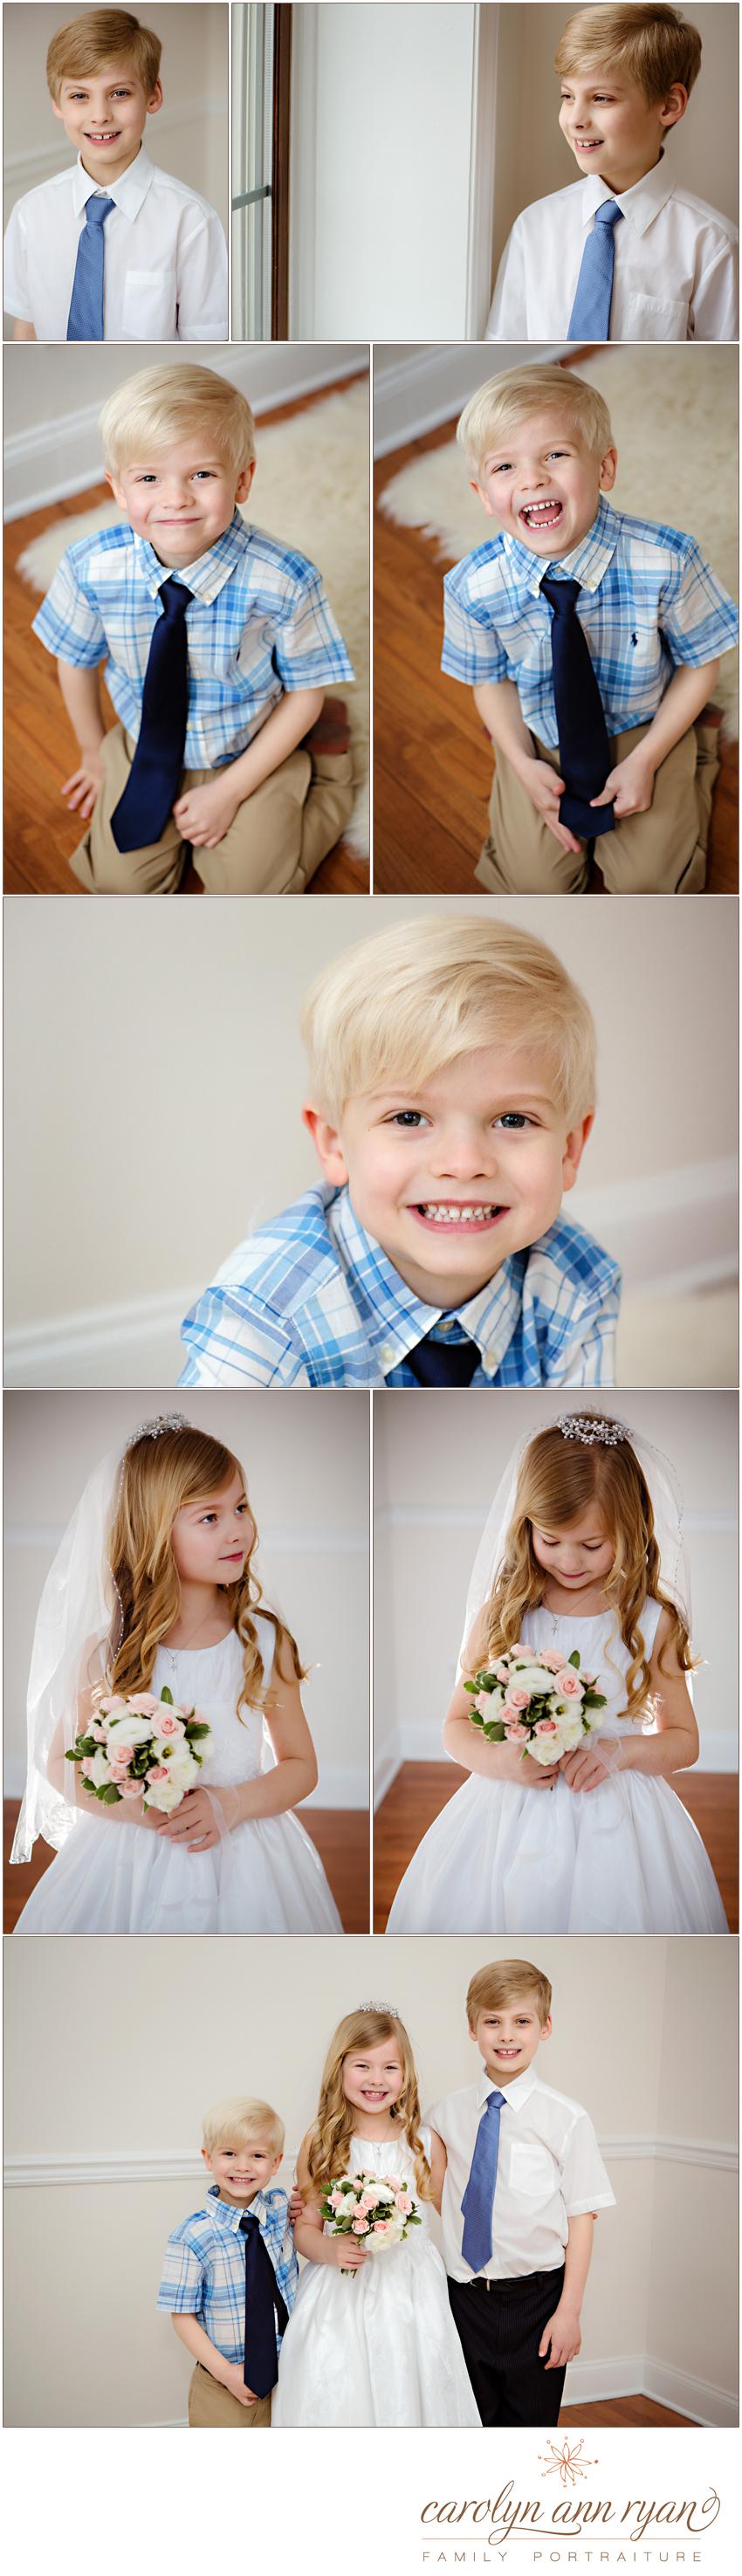 Westfield NJ Child & Family Photographer Carlyn Ann Ryan photographs a beautiful family